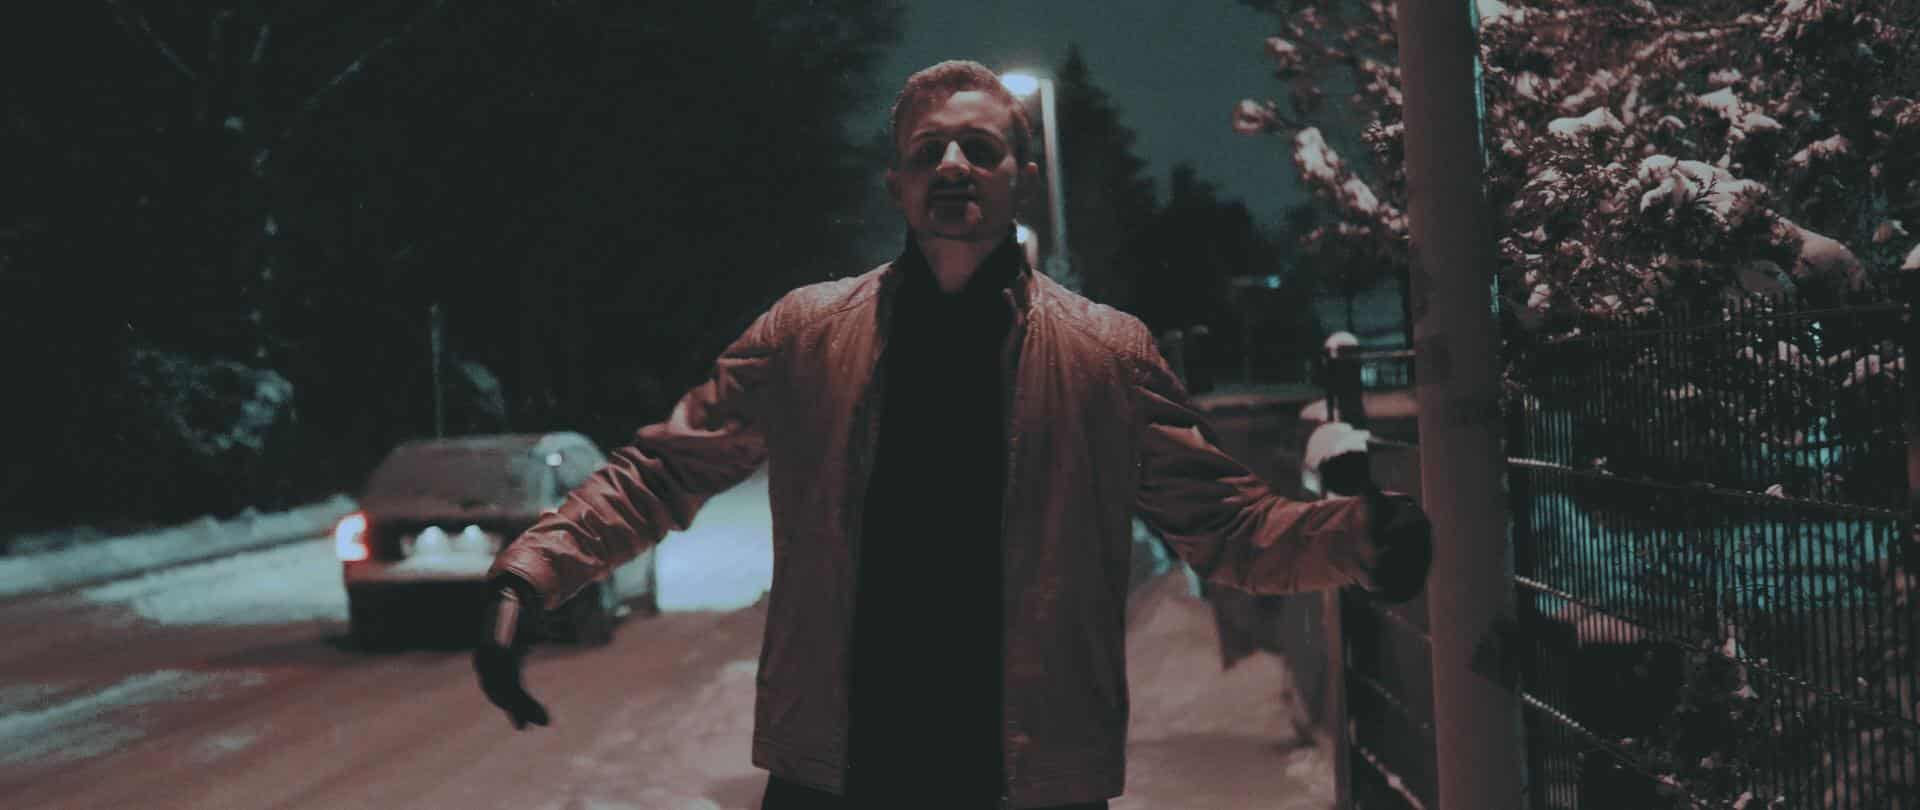 Blazin'Daniel - Reanimation (Musikvideo).00_01_32_55.Standbild248